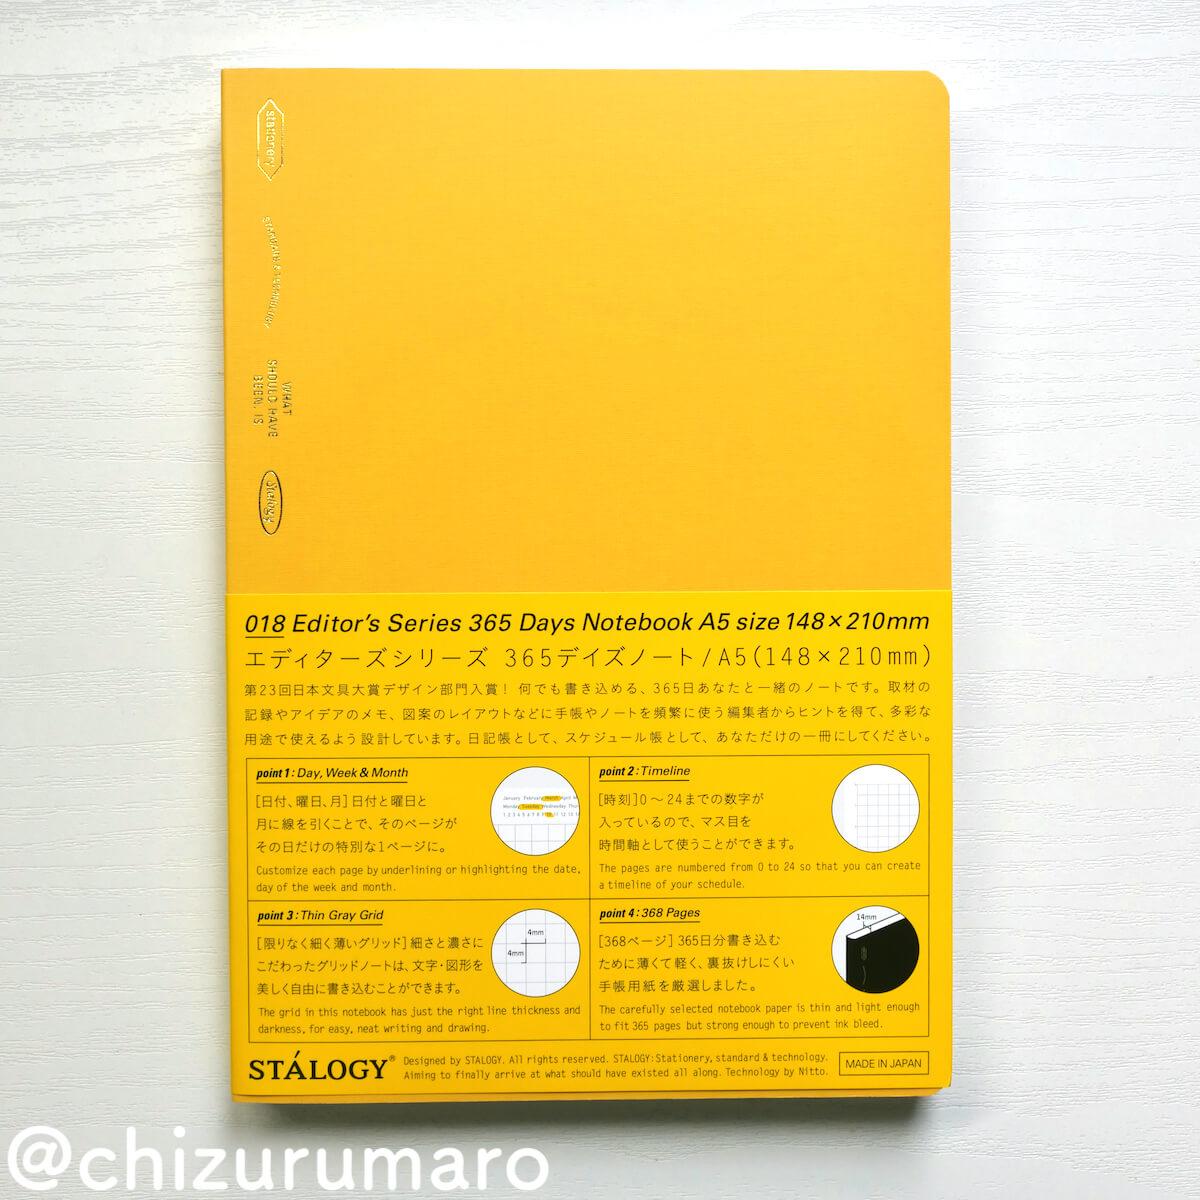 f:id:chizurumaro:20201223115919j:plain